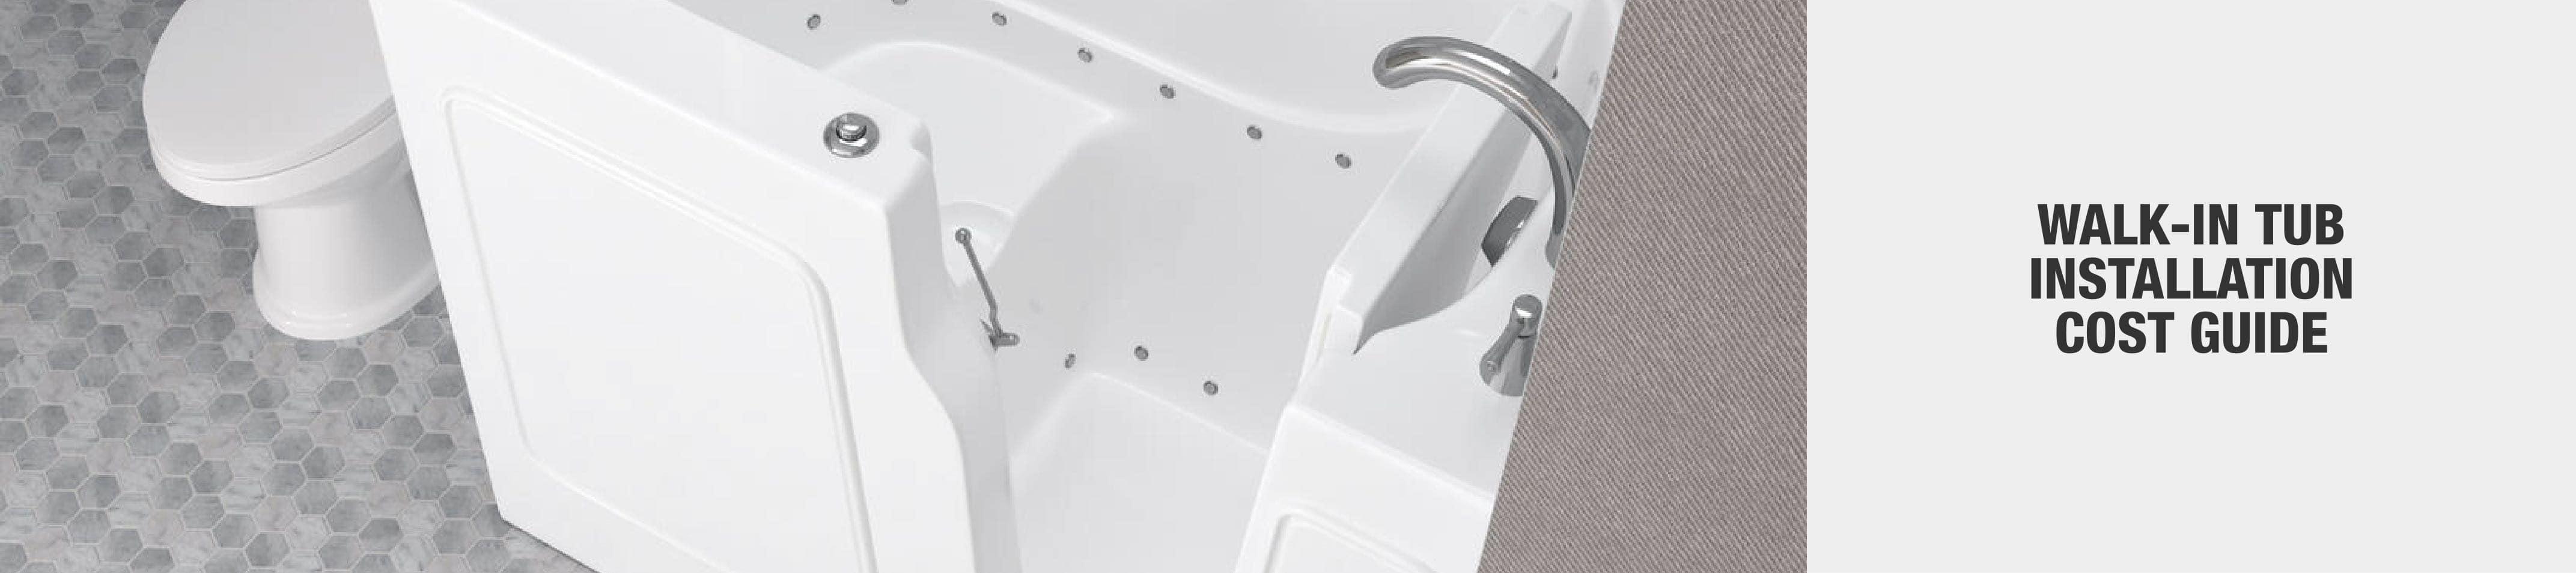 Walk-In Tub Installation Cost Guide